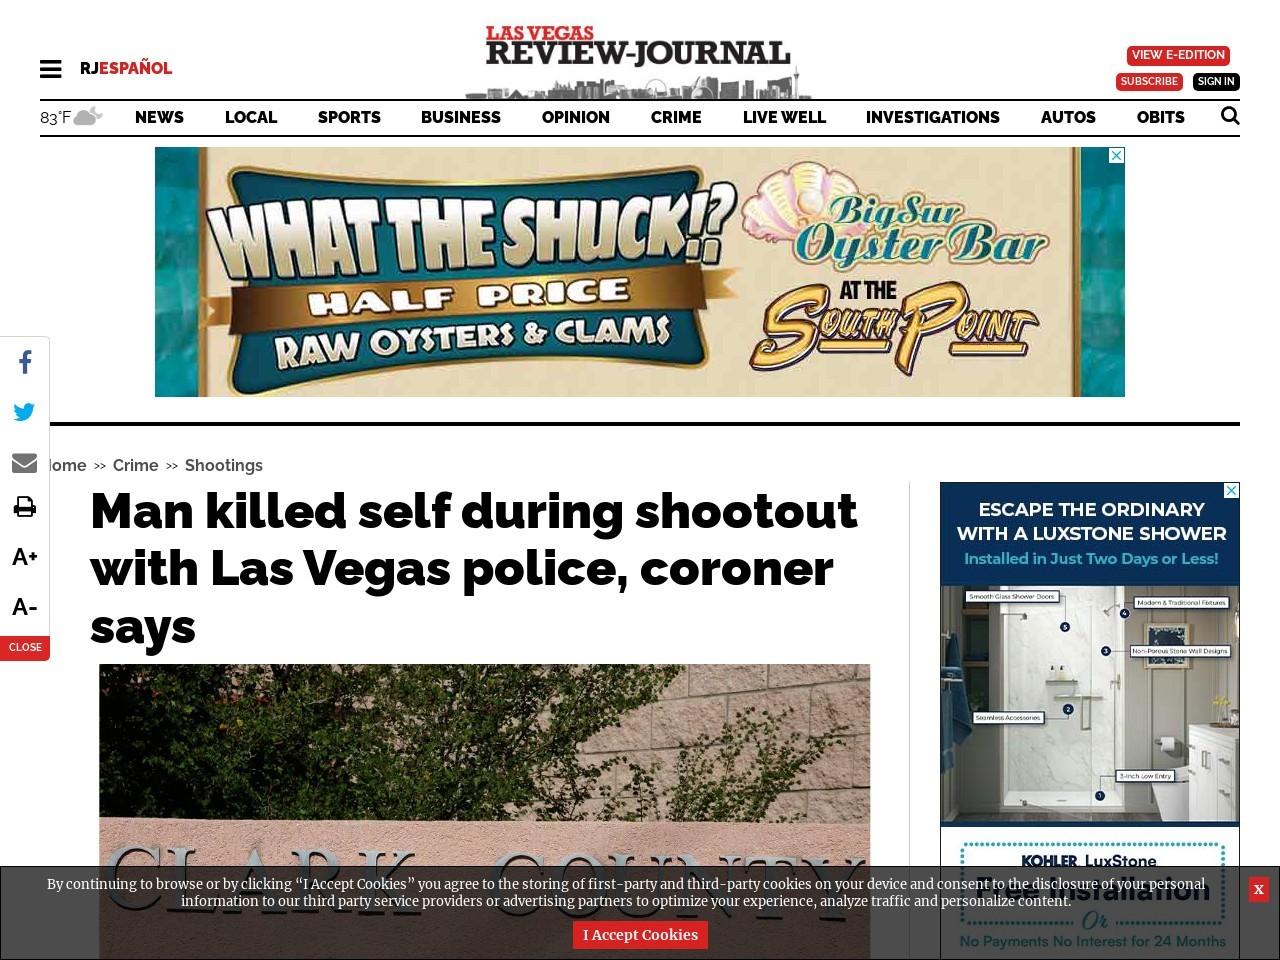 Man killed self during shootout with Las Vegas police, coroner says